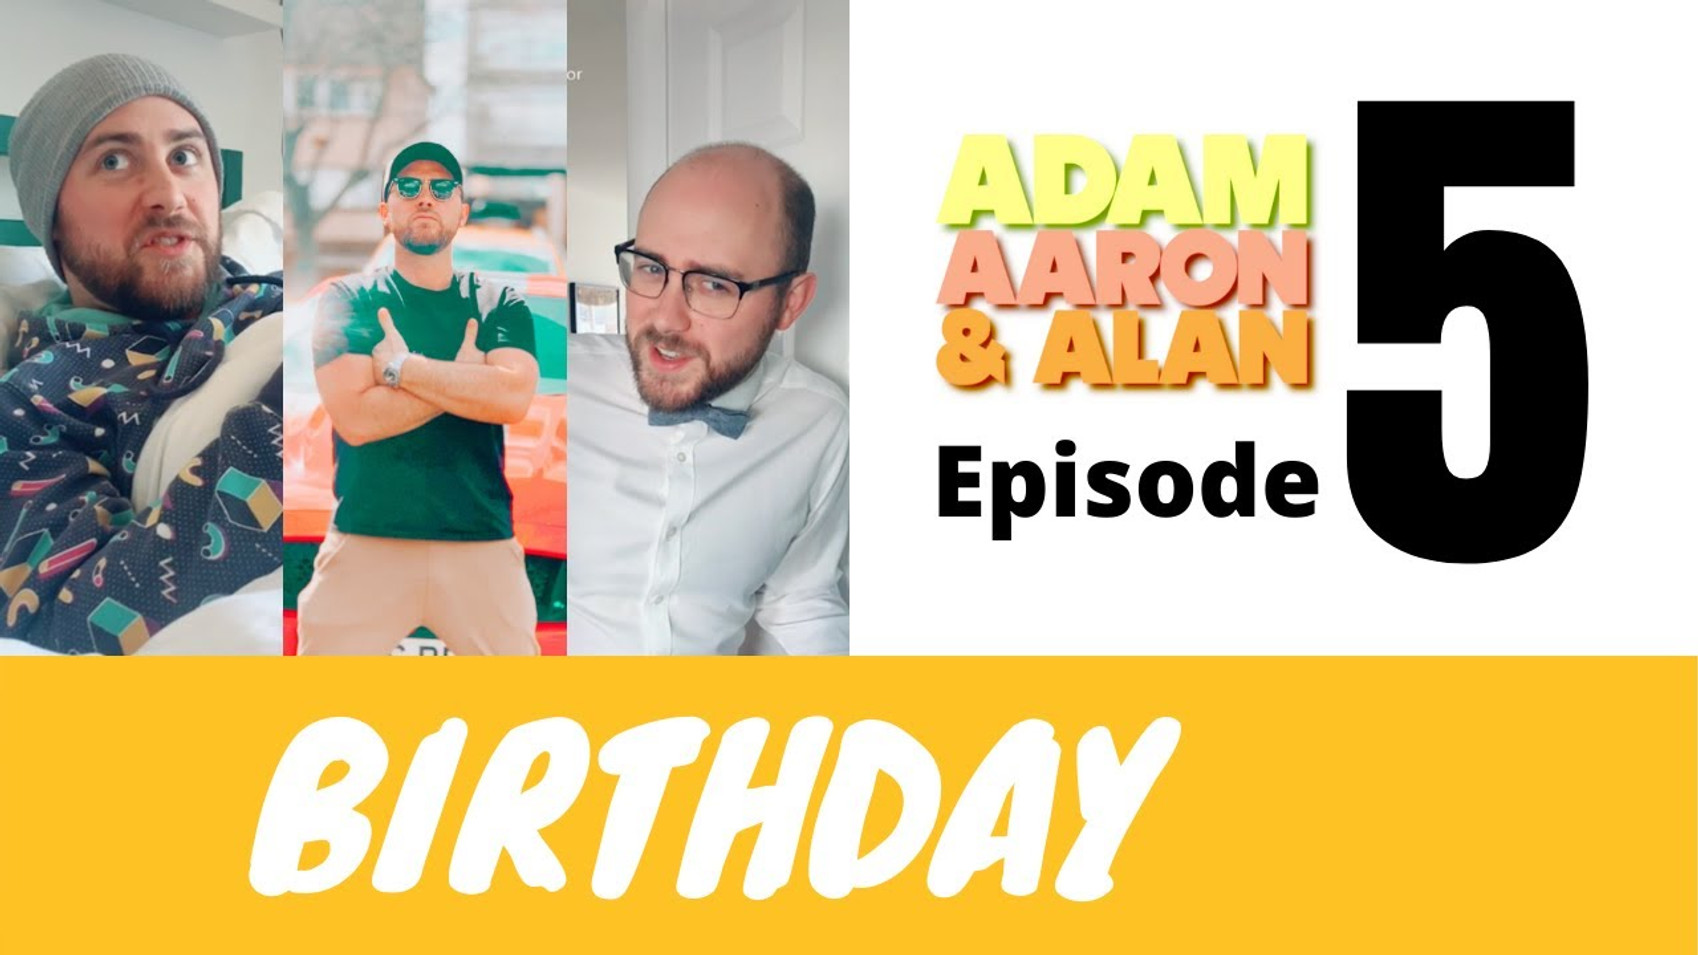 Adam, Aaron & Alan Ep.5 - Birthday